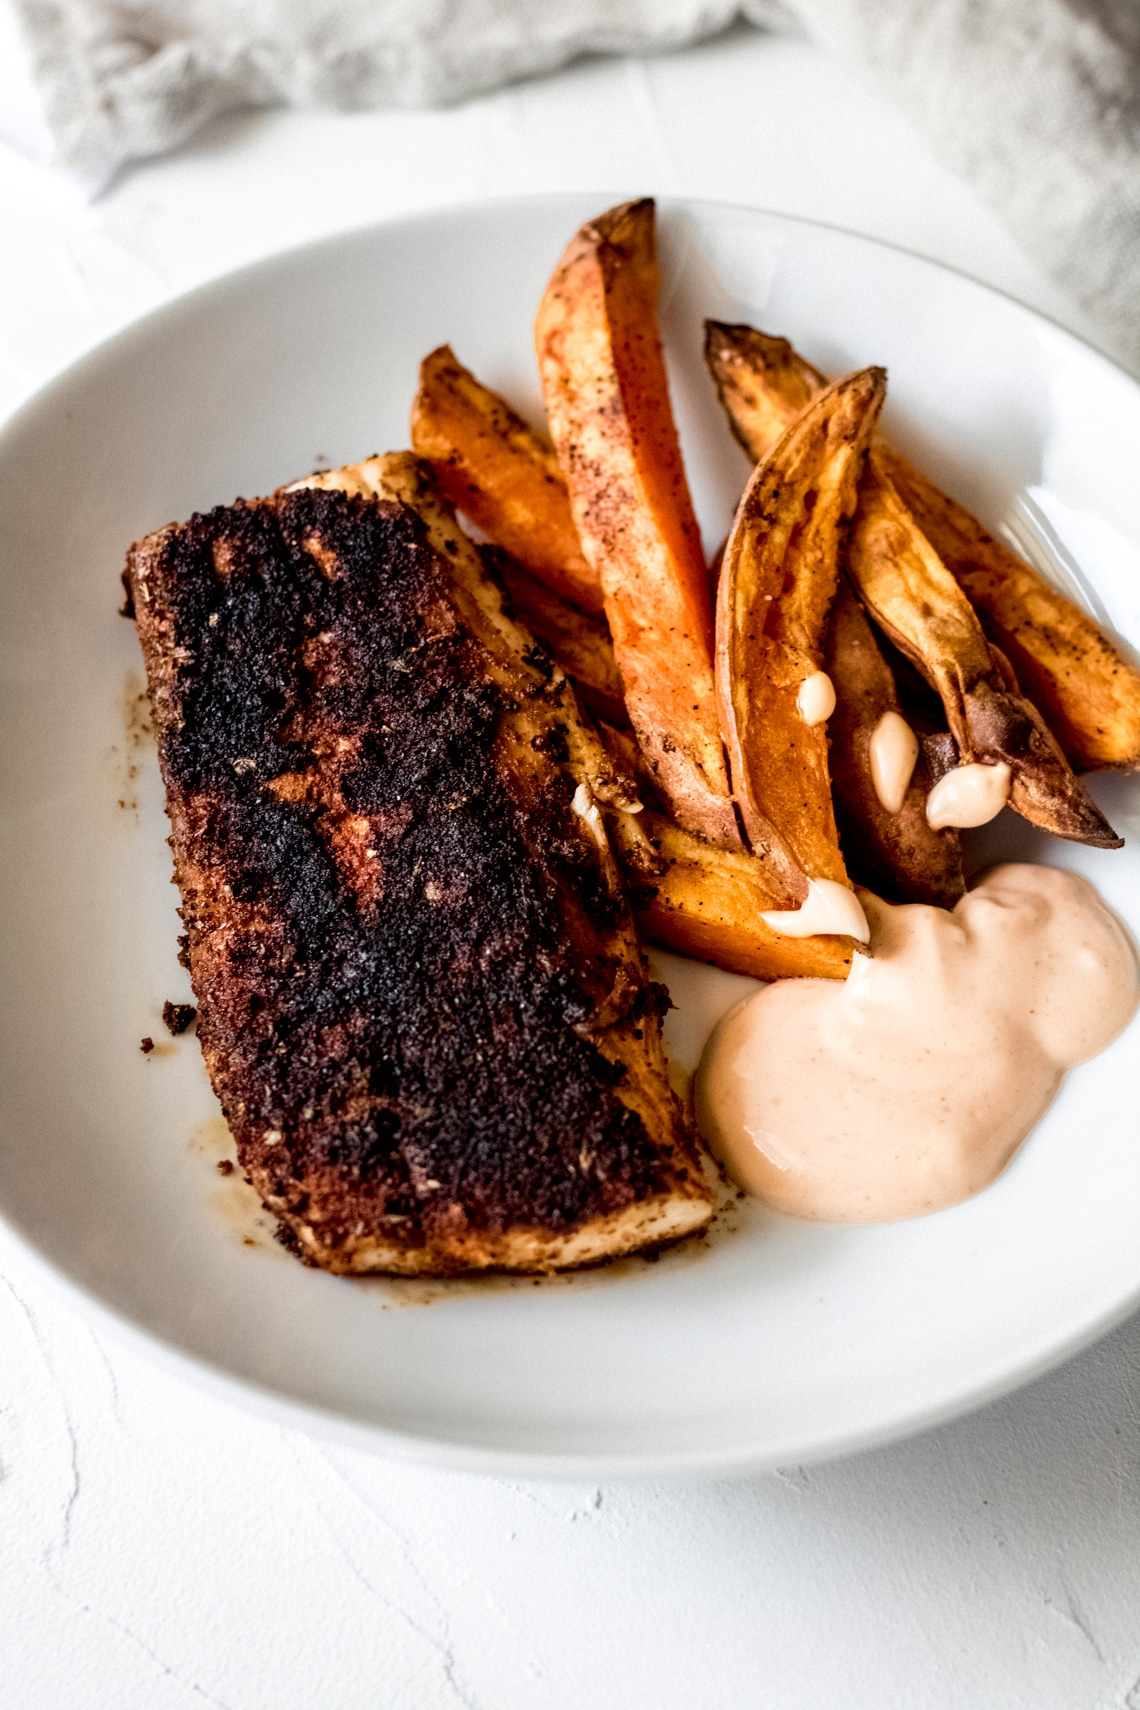 one mahi mahi fillet, sweet potato fries, and dipping sauce in a white bowl